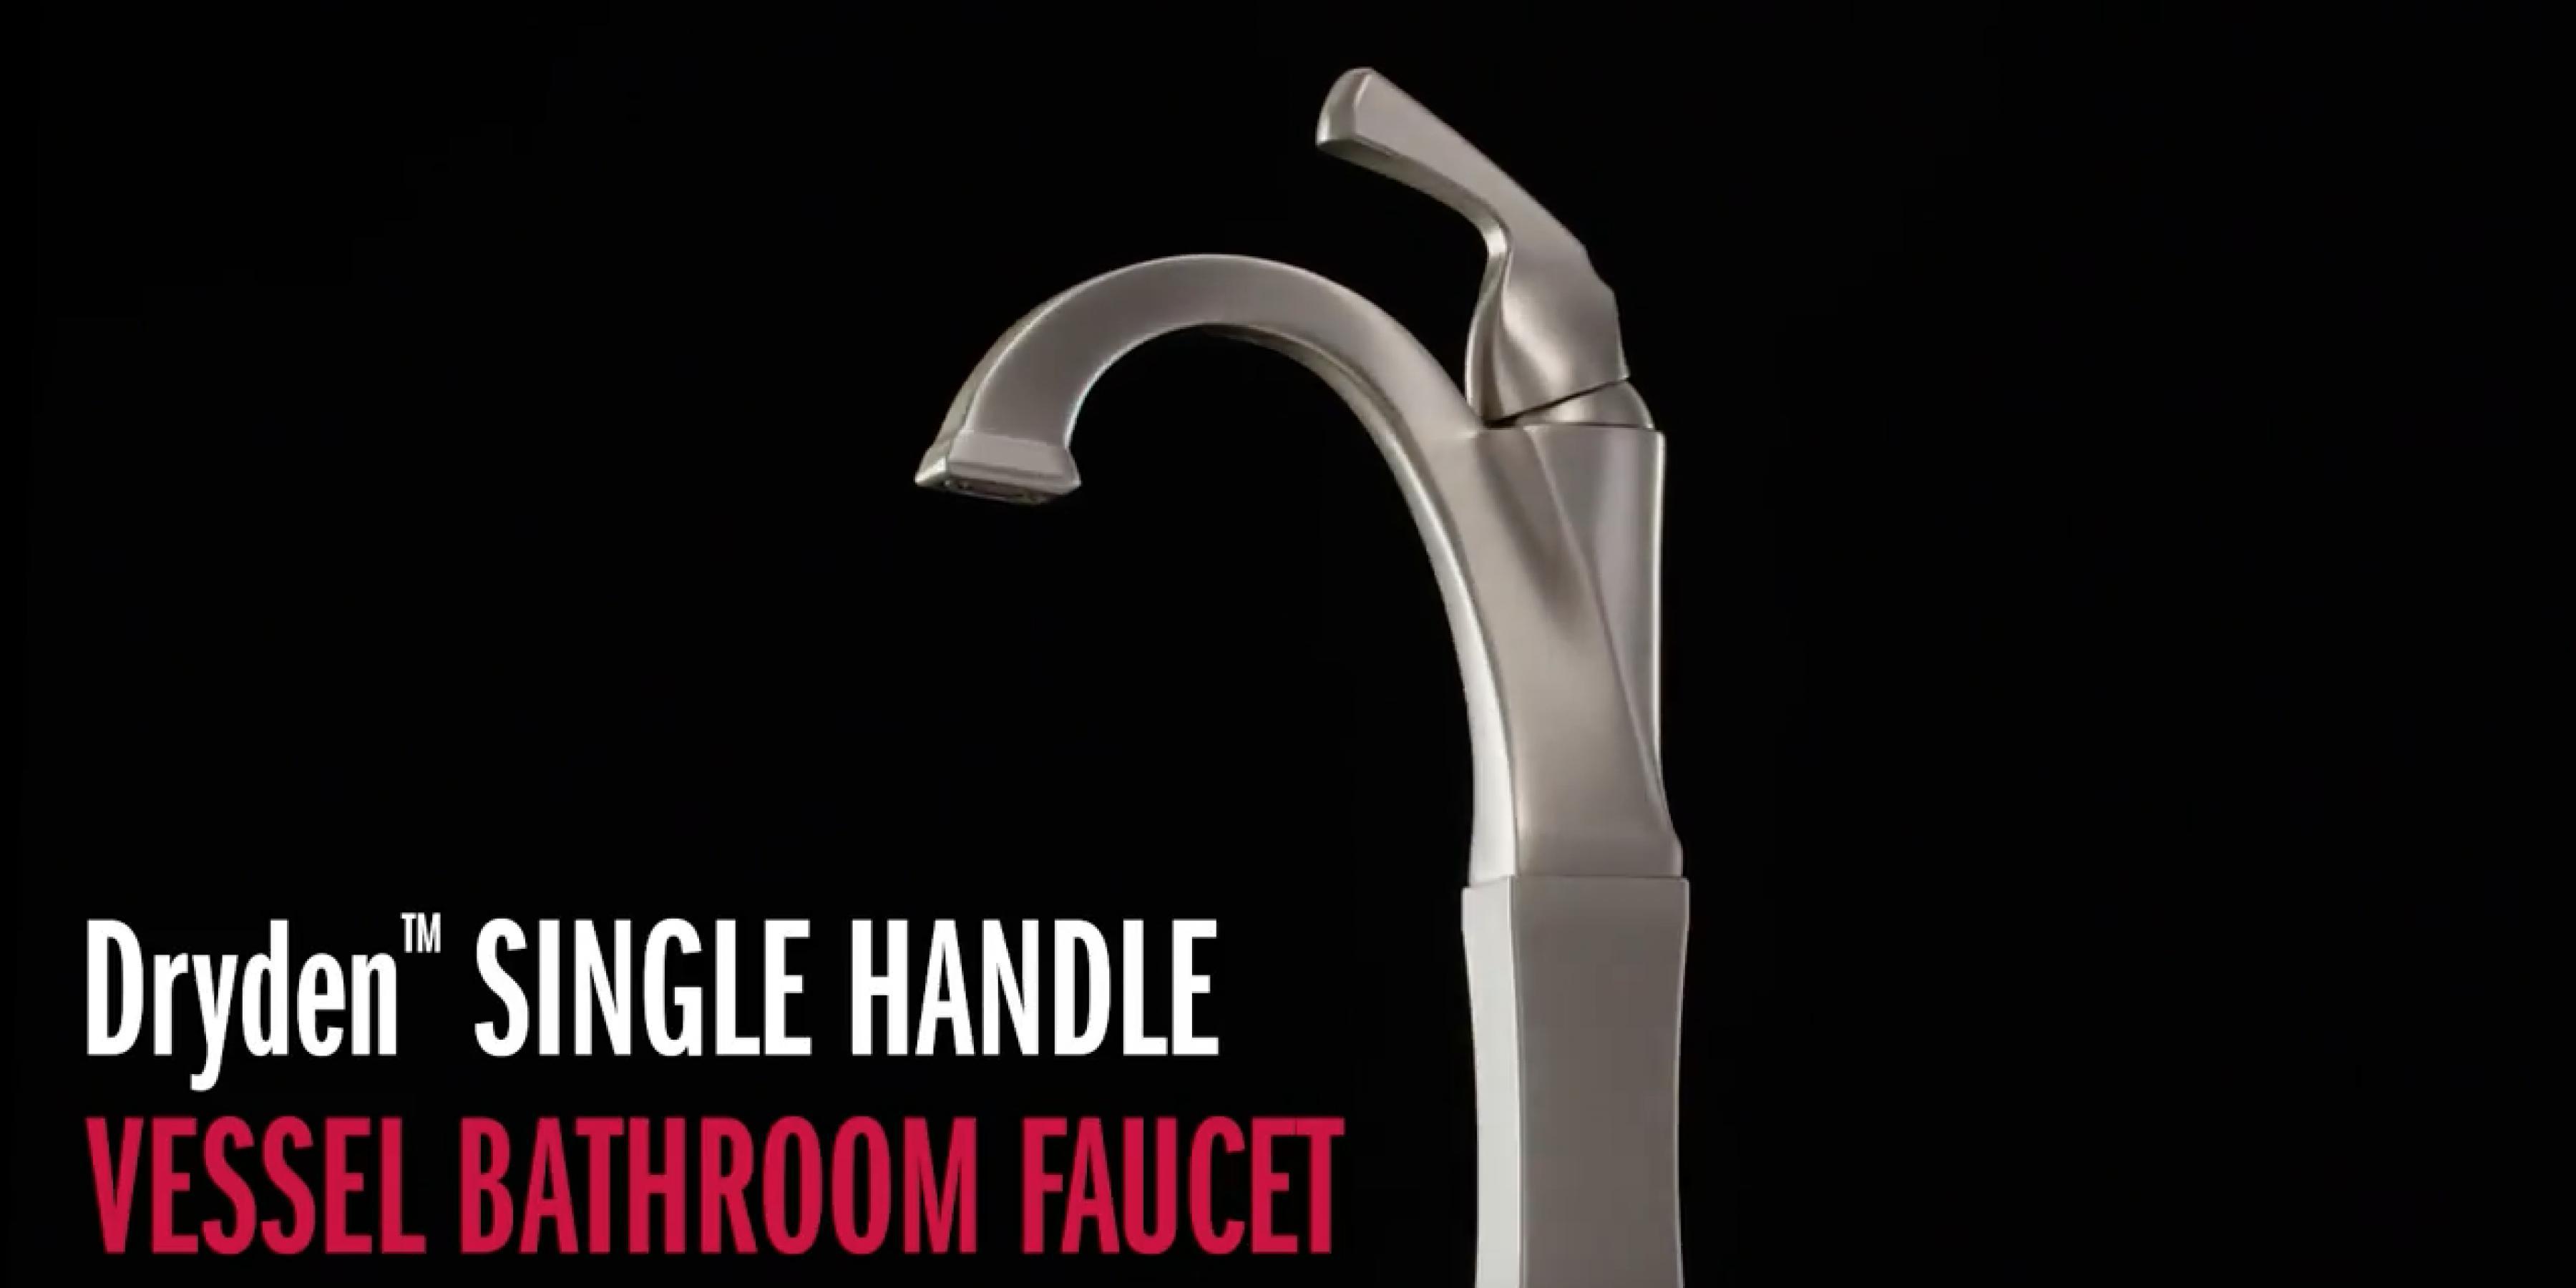 Dryden™ Single Handle Vessel Bathroom Faucet